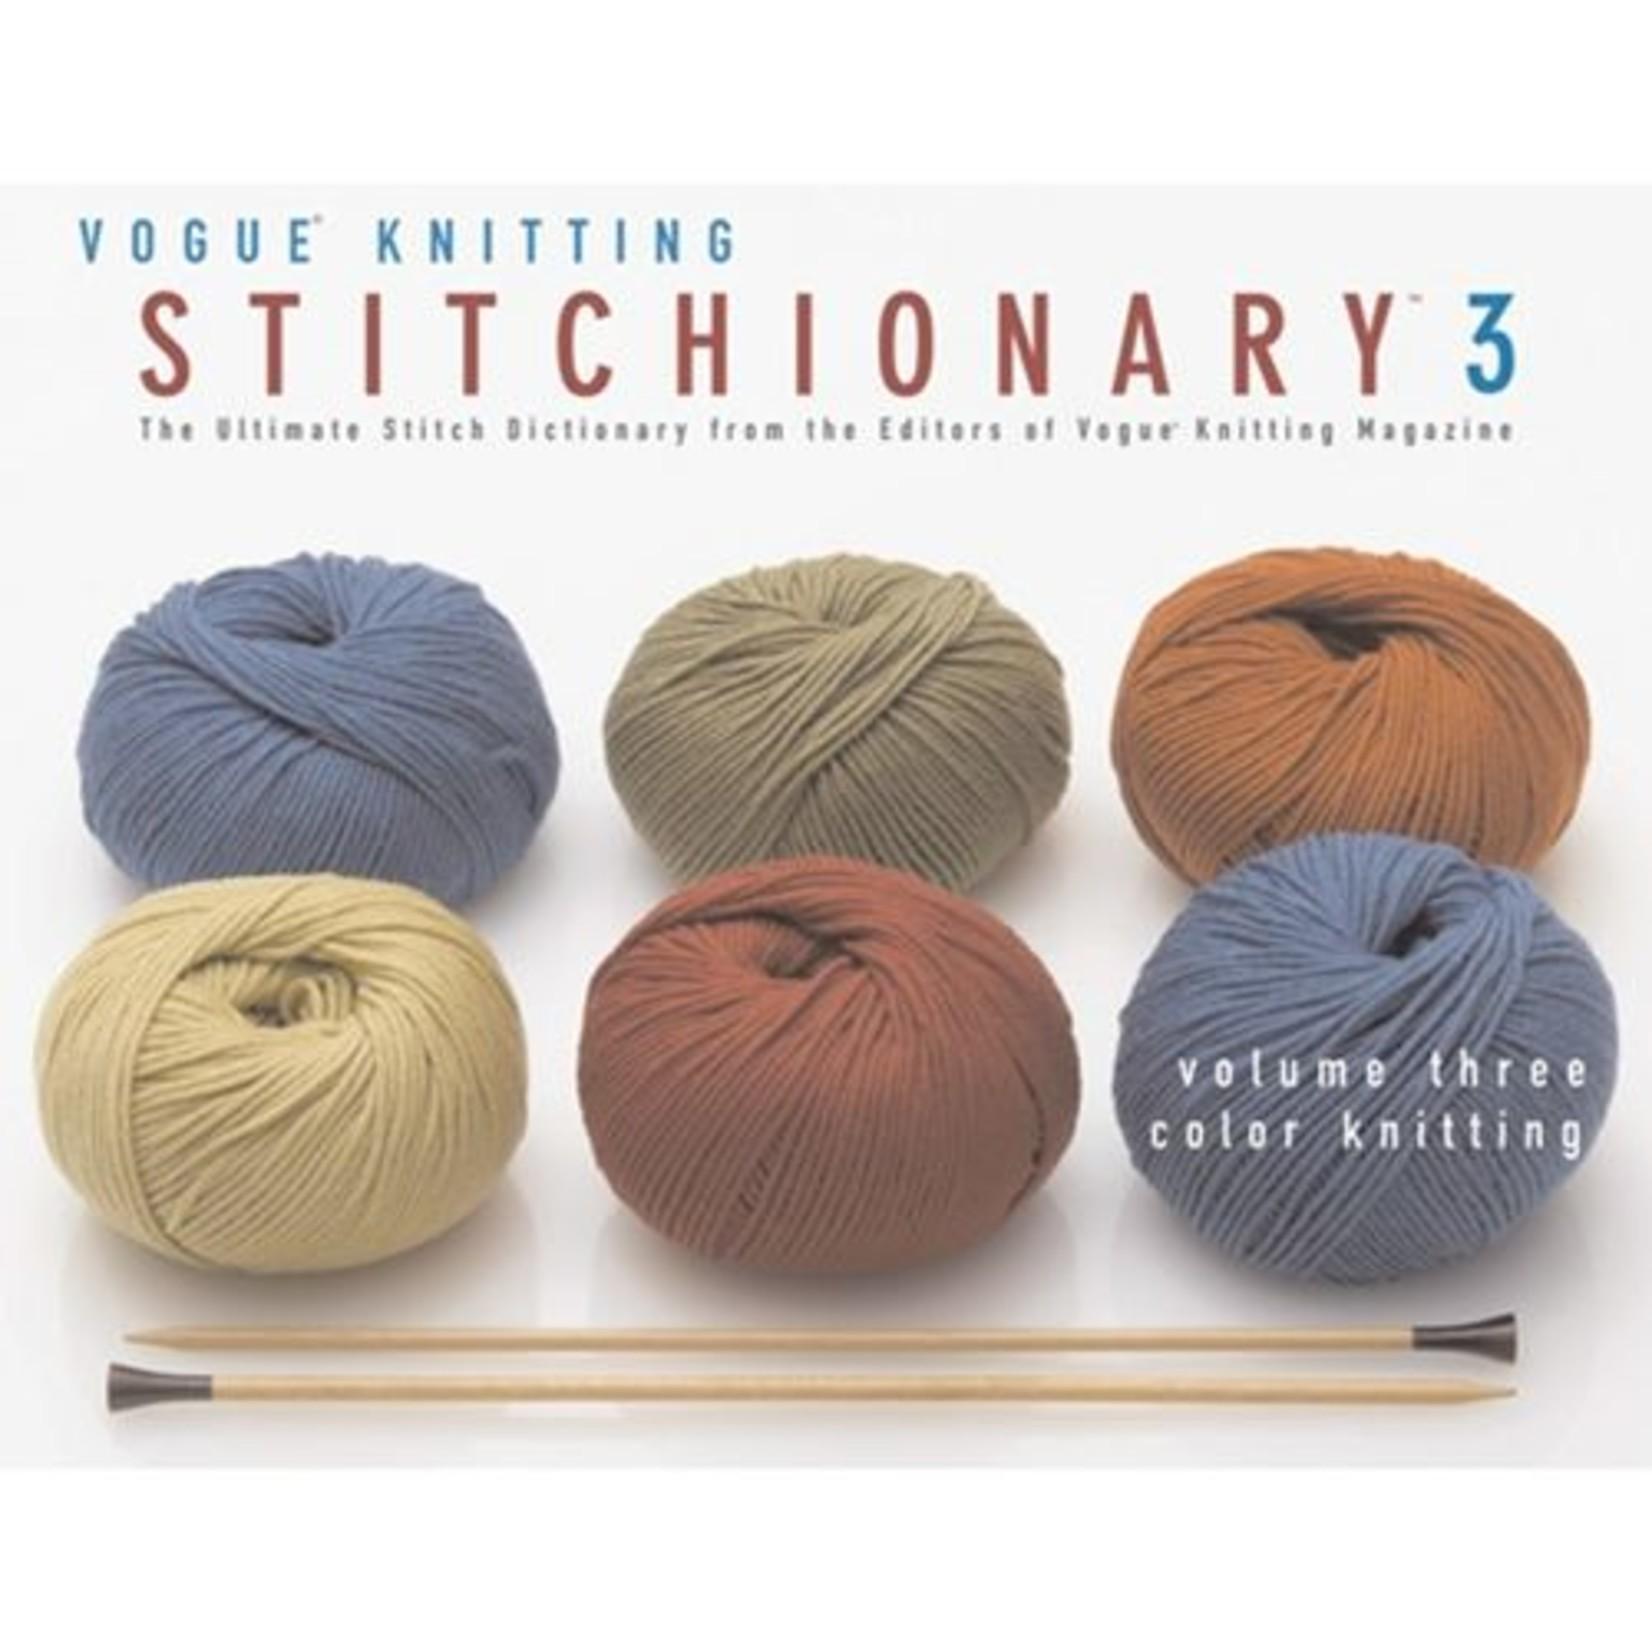 Vogue Knitting Stitchionary Volume 3